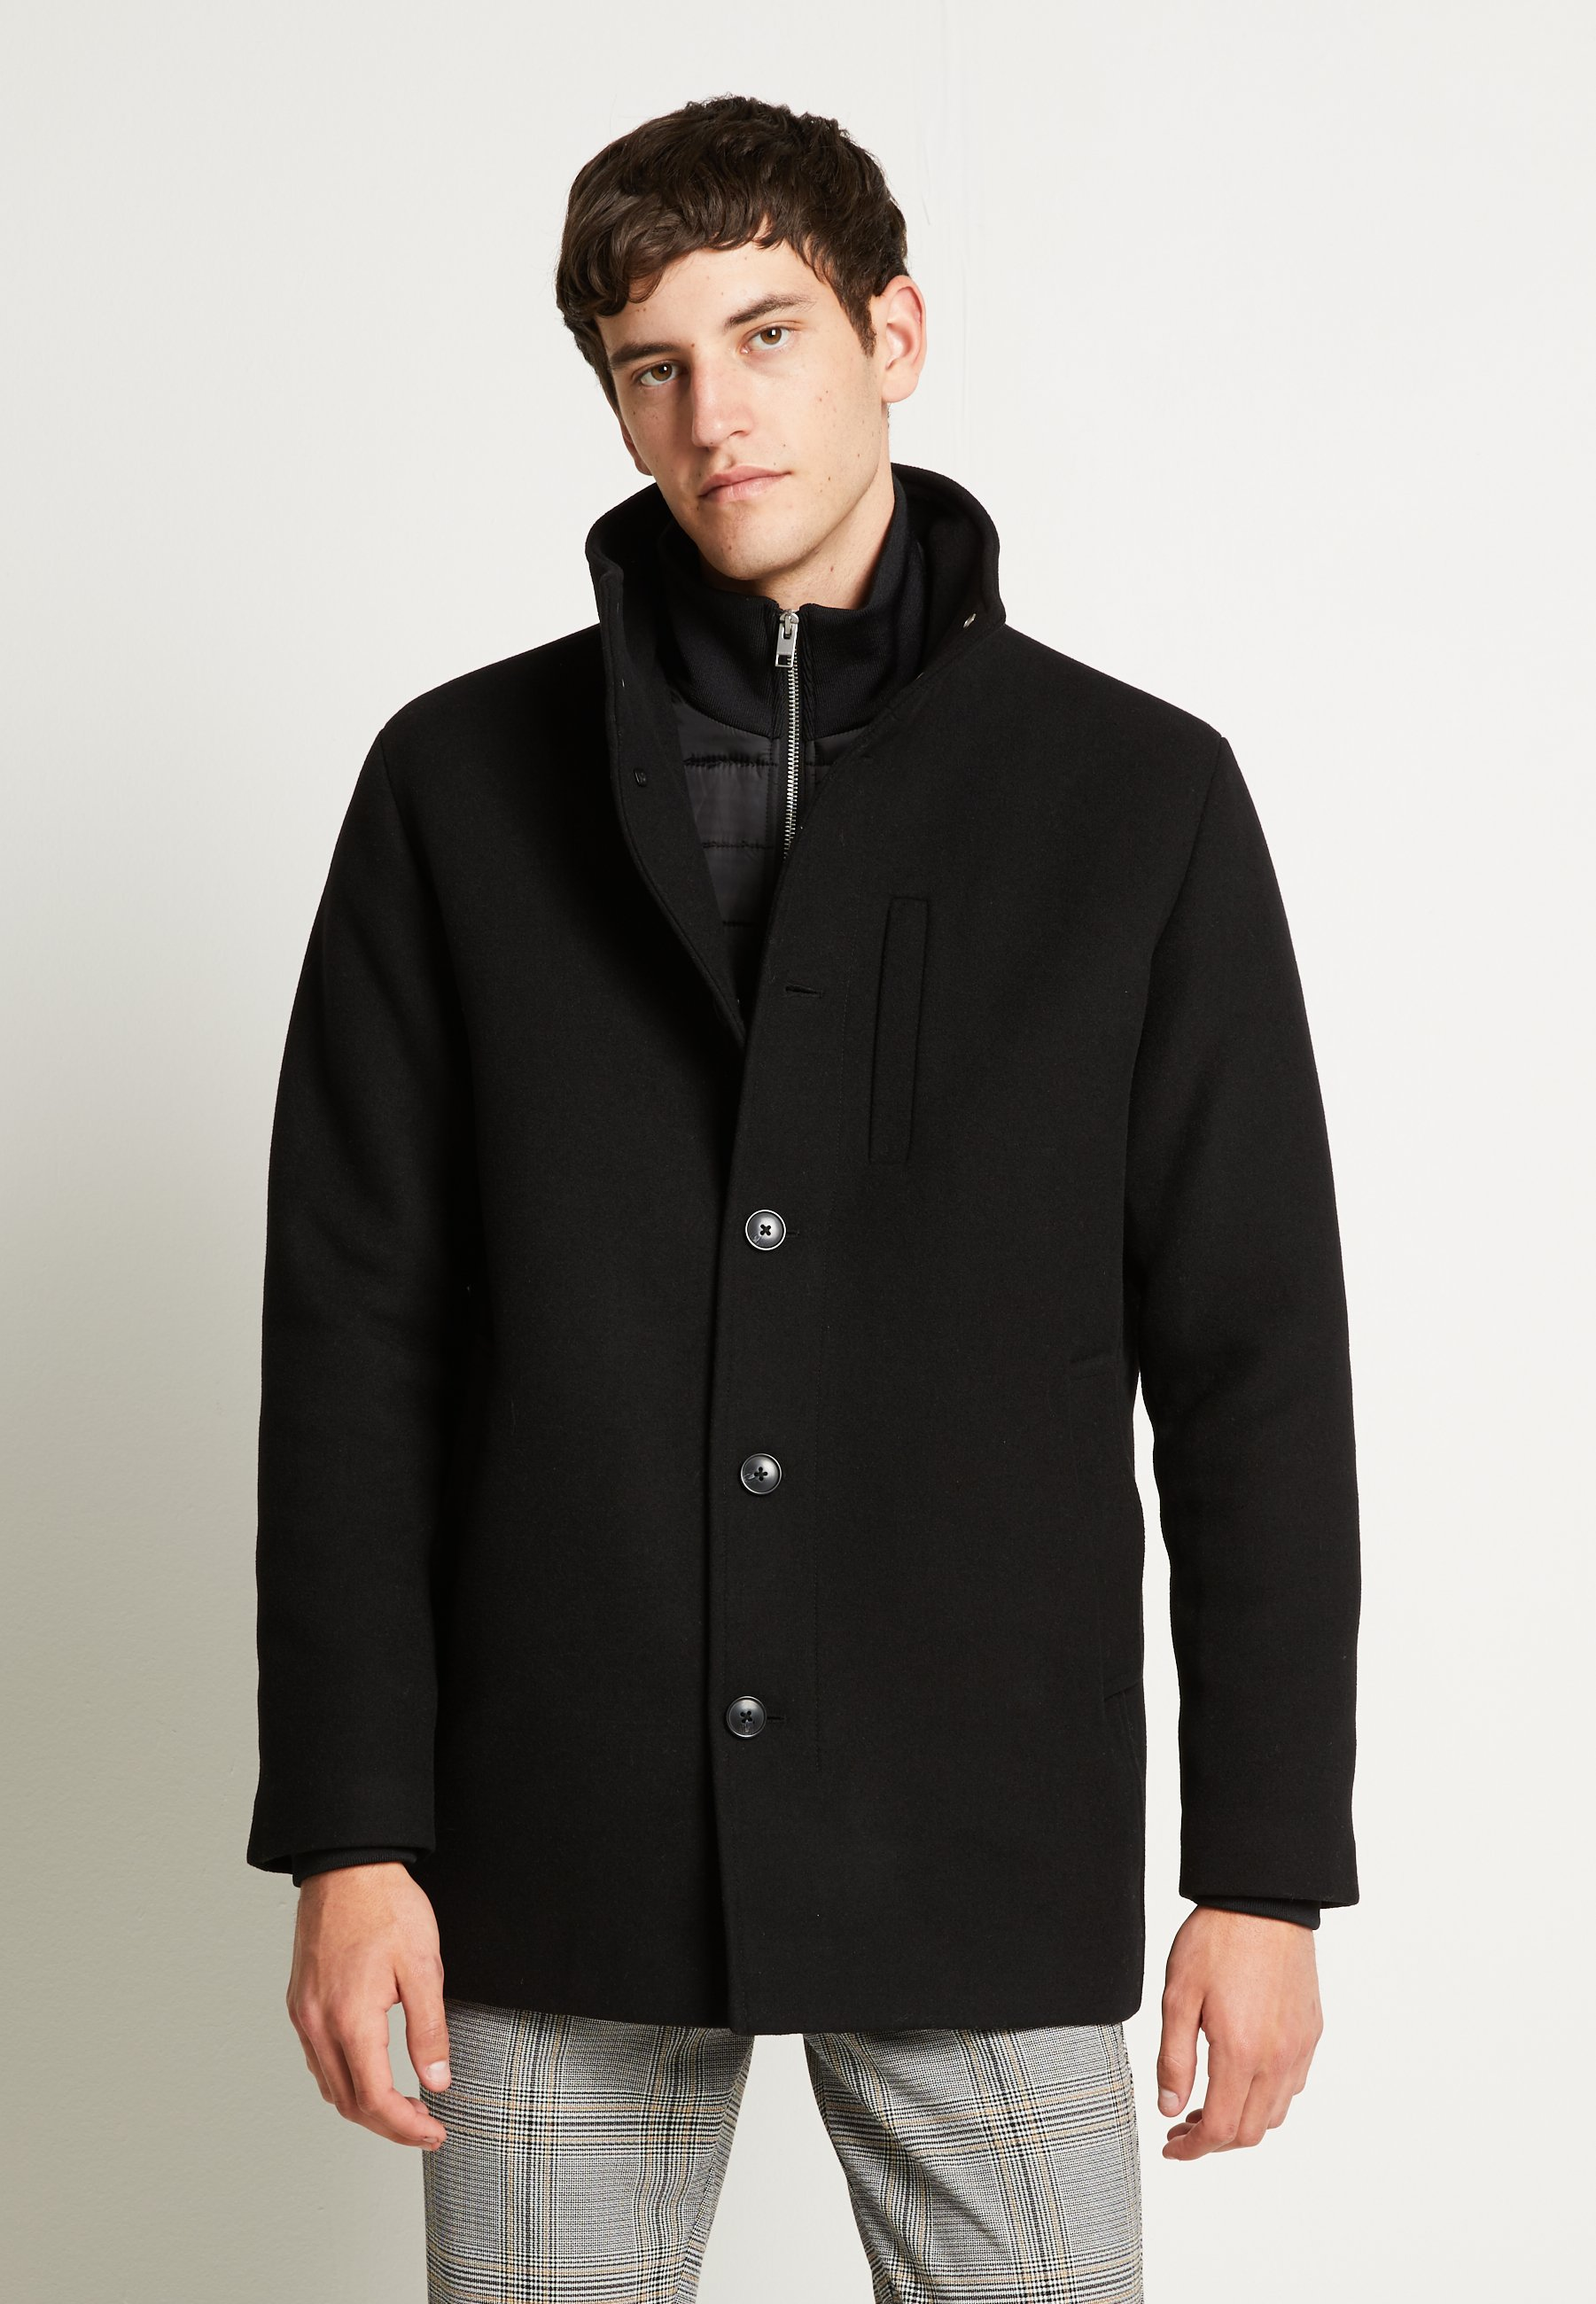 Uomo JJDUAL JACKET - Cappotto classico